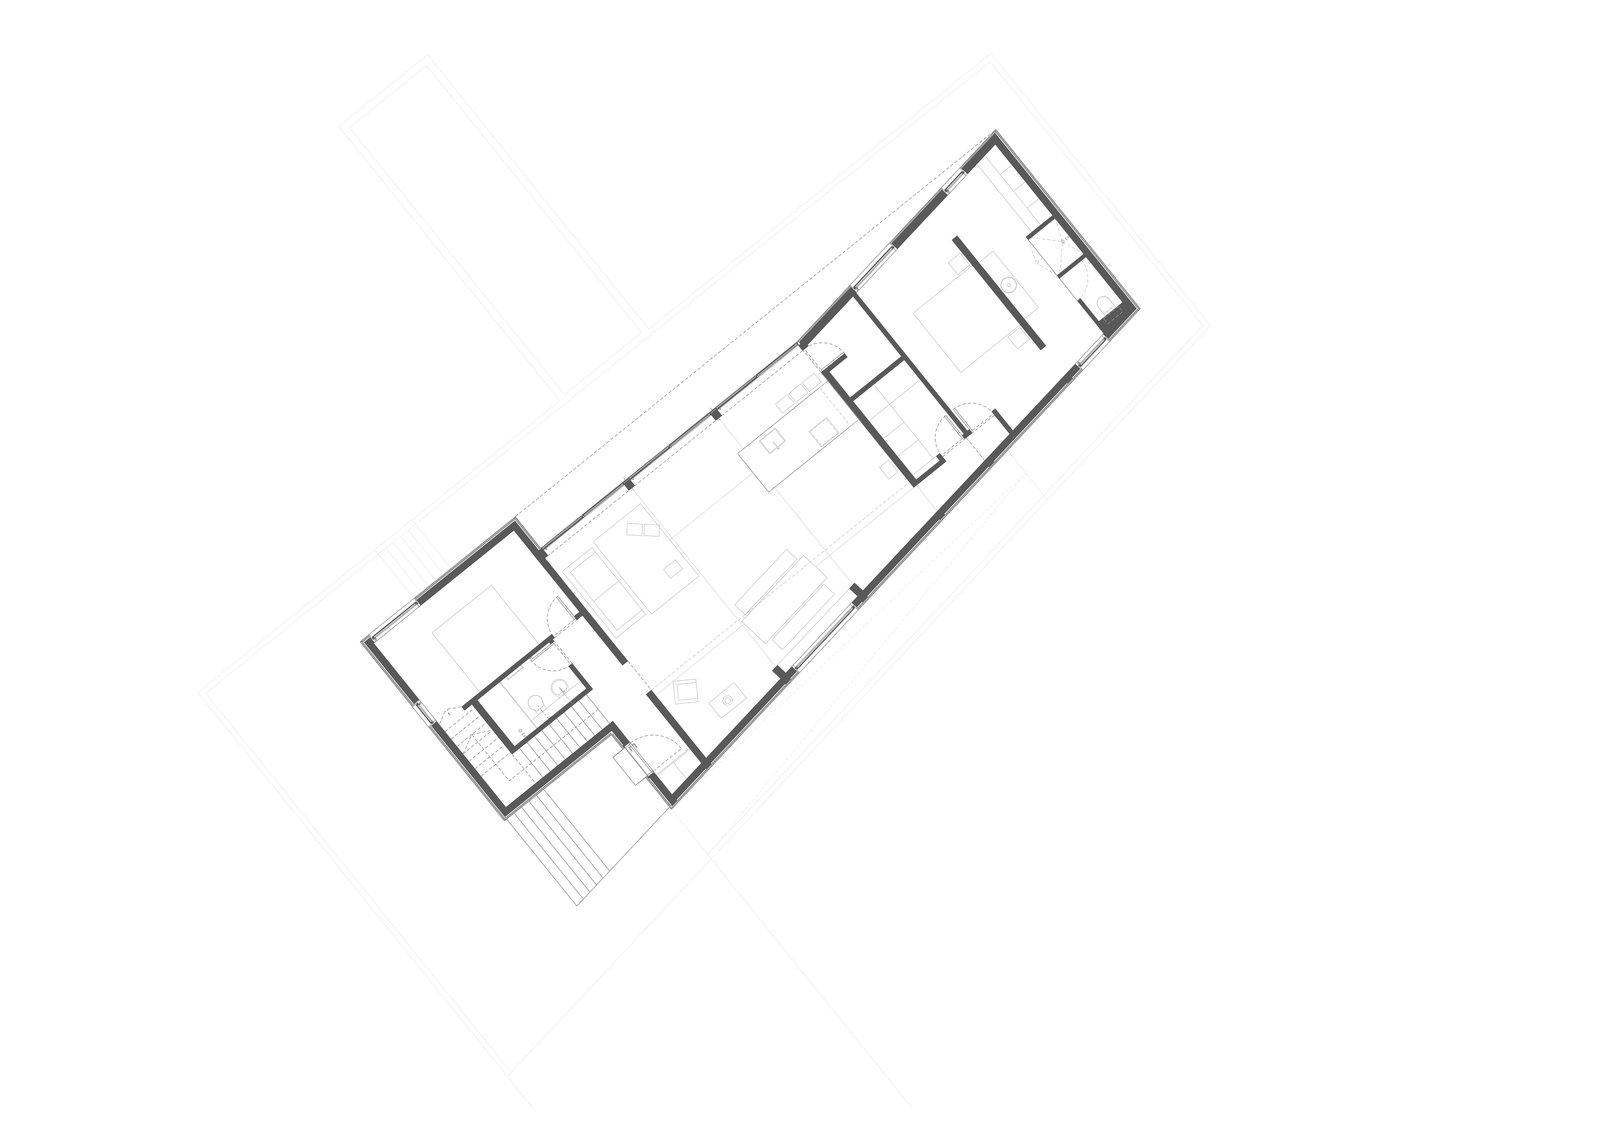 Ground level floor plan drawing.